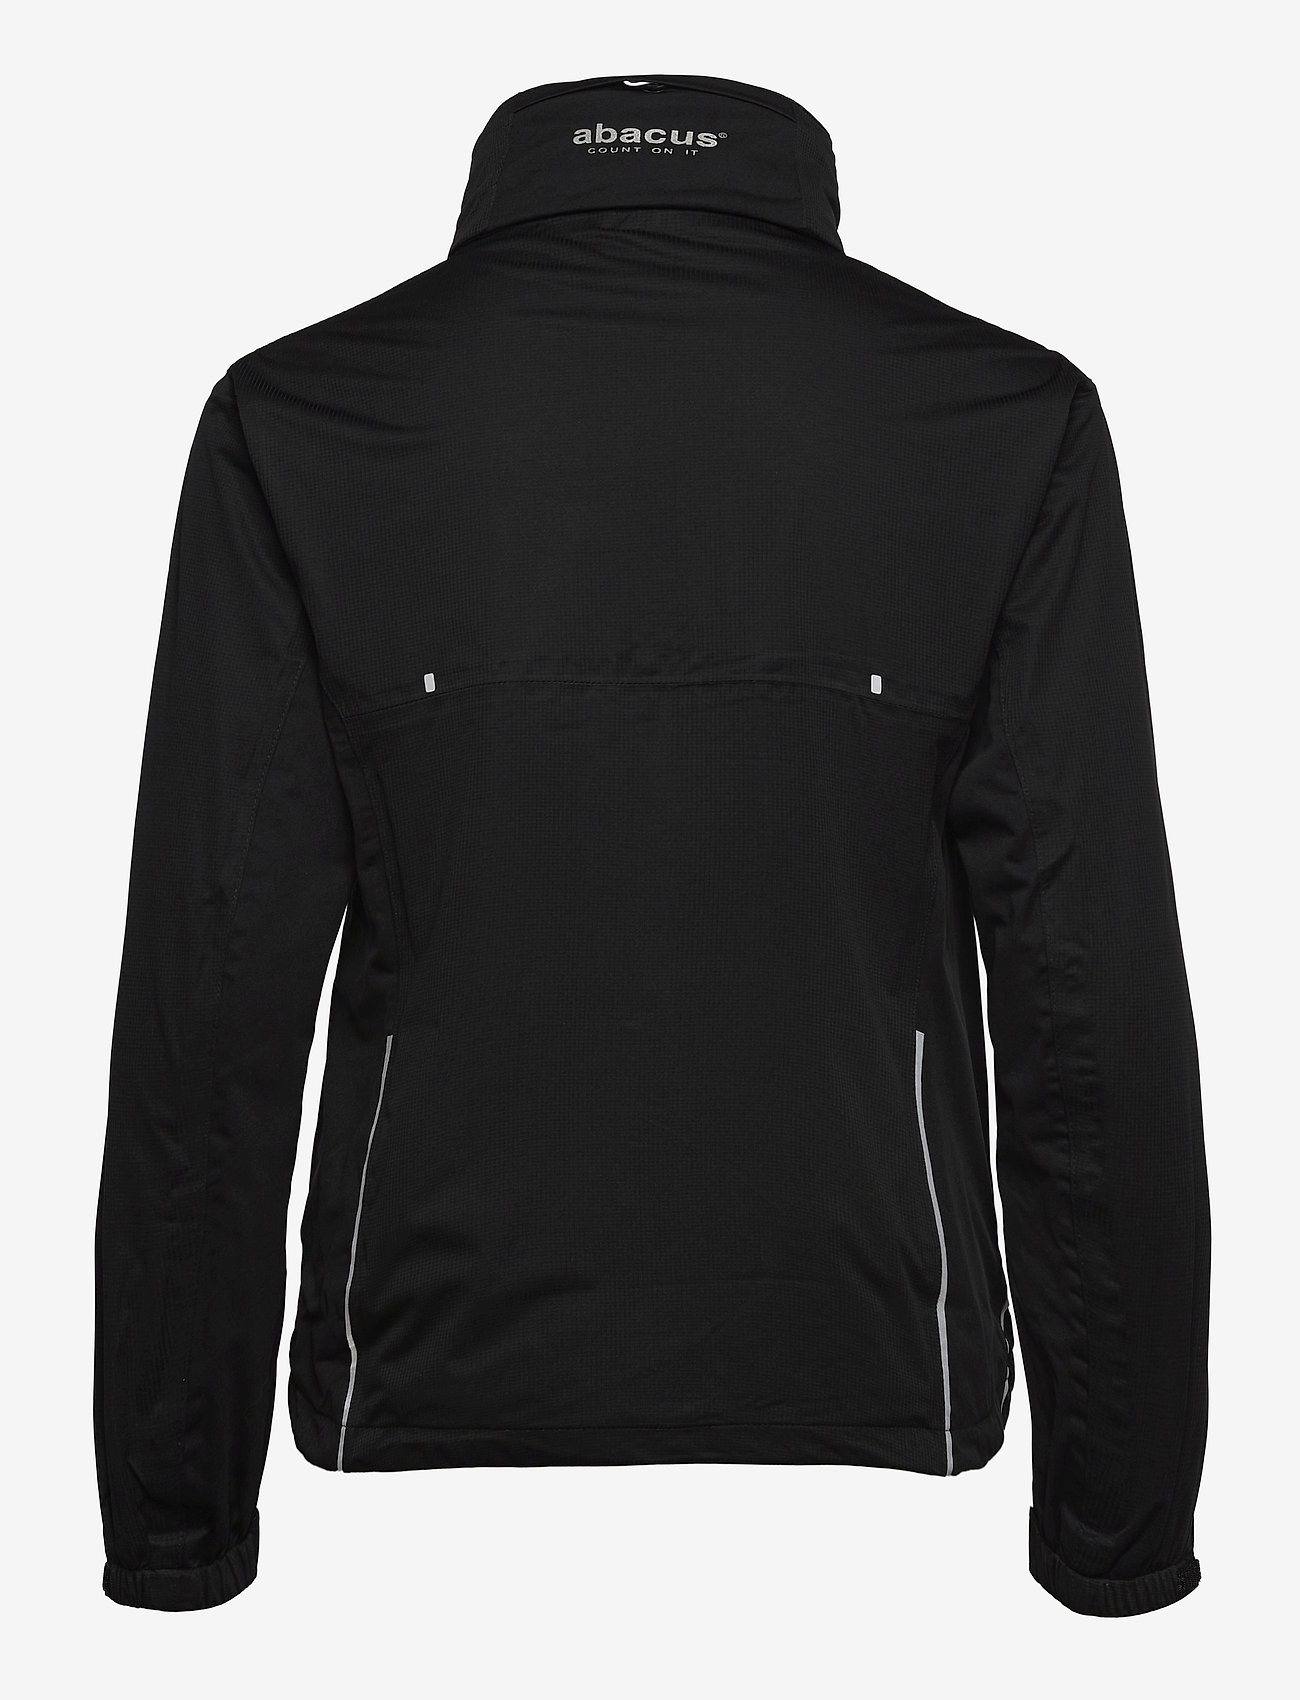 Abacus - Lds Swinley rainjacket - golf jassen - black - 1